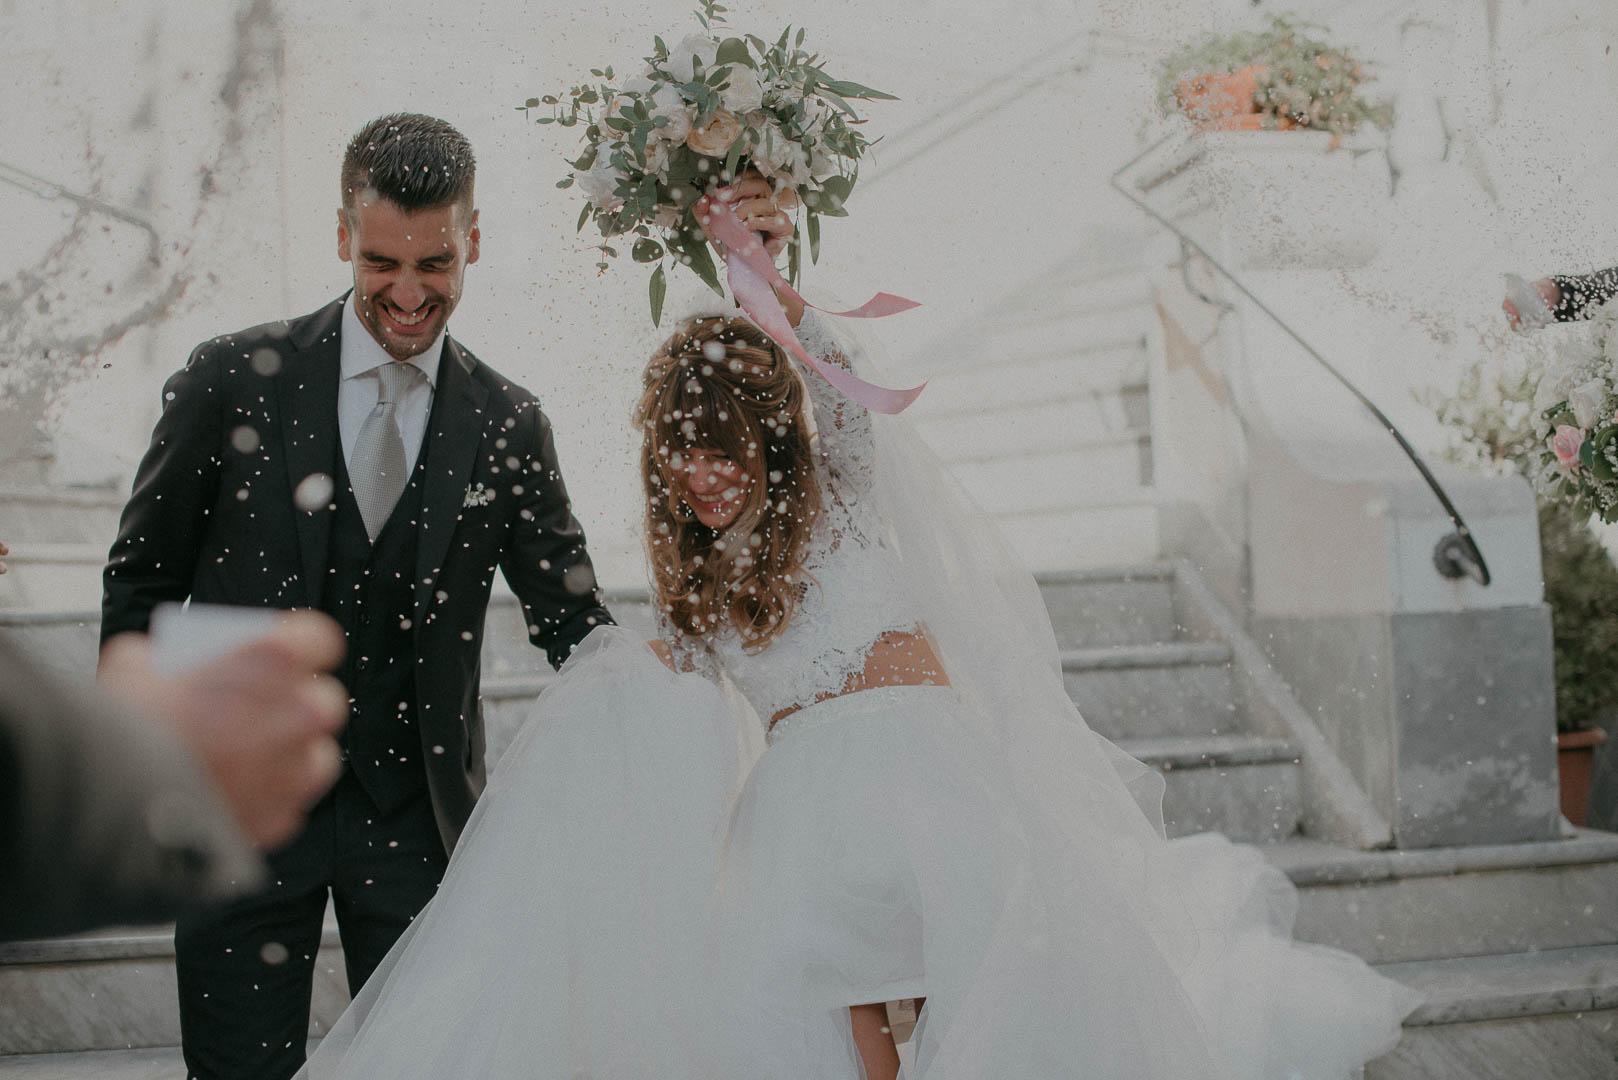 wedding-photographer-destination-fineart-bespoke-reportage-napoli-nabilah-vivianeizzo-spazio46-79